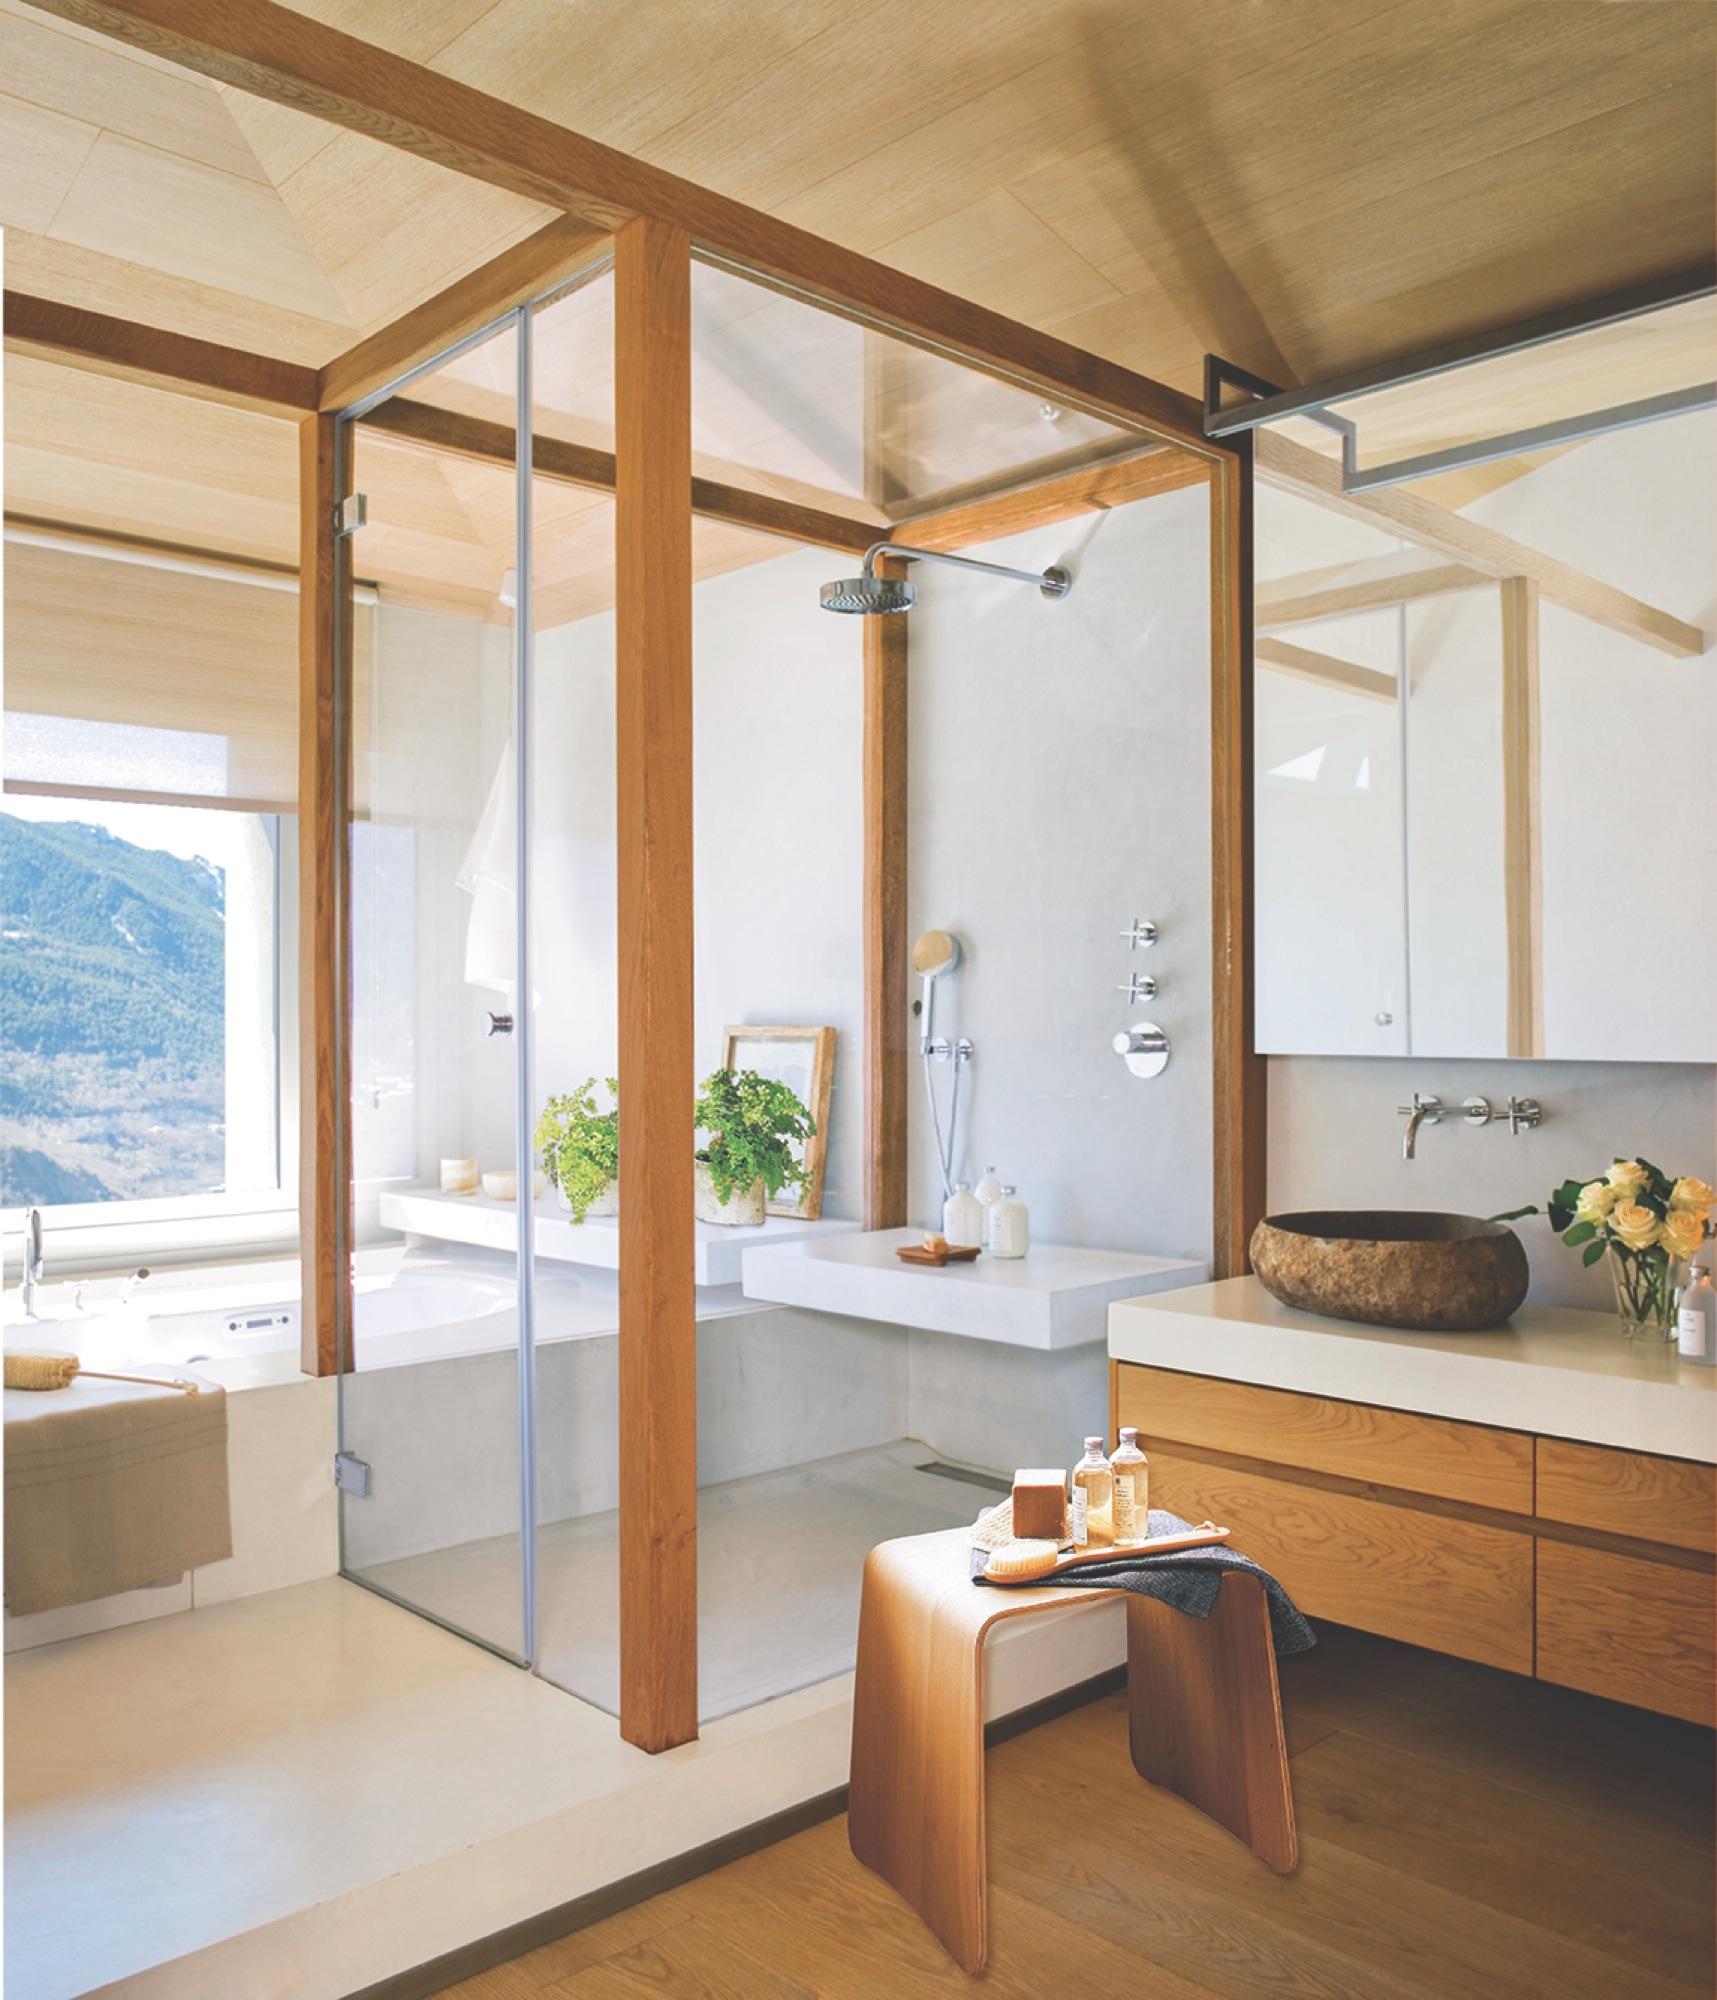 10 ba os espectaculares con 30 ideas muy pr cticas for Banos modernos con ducha y banera